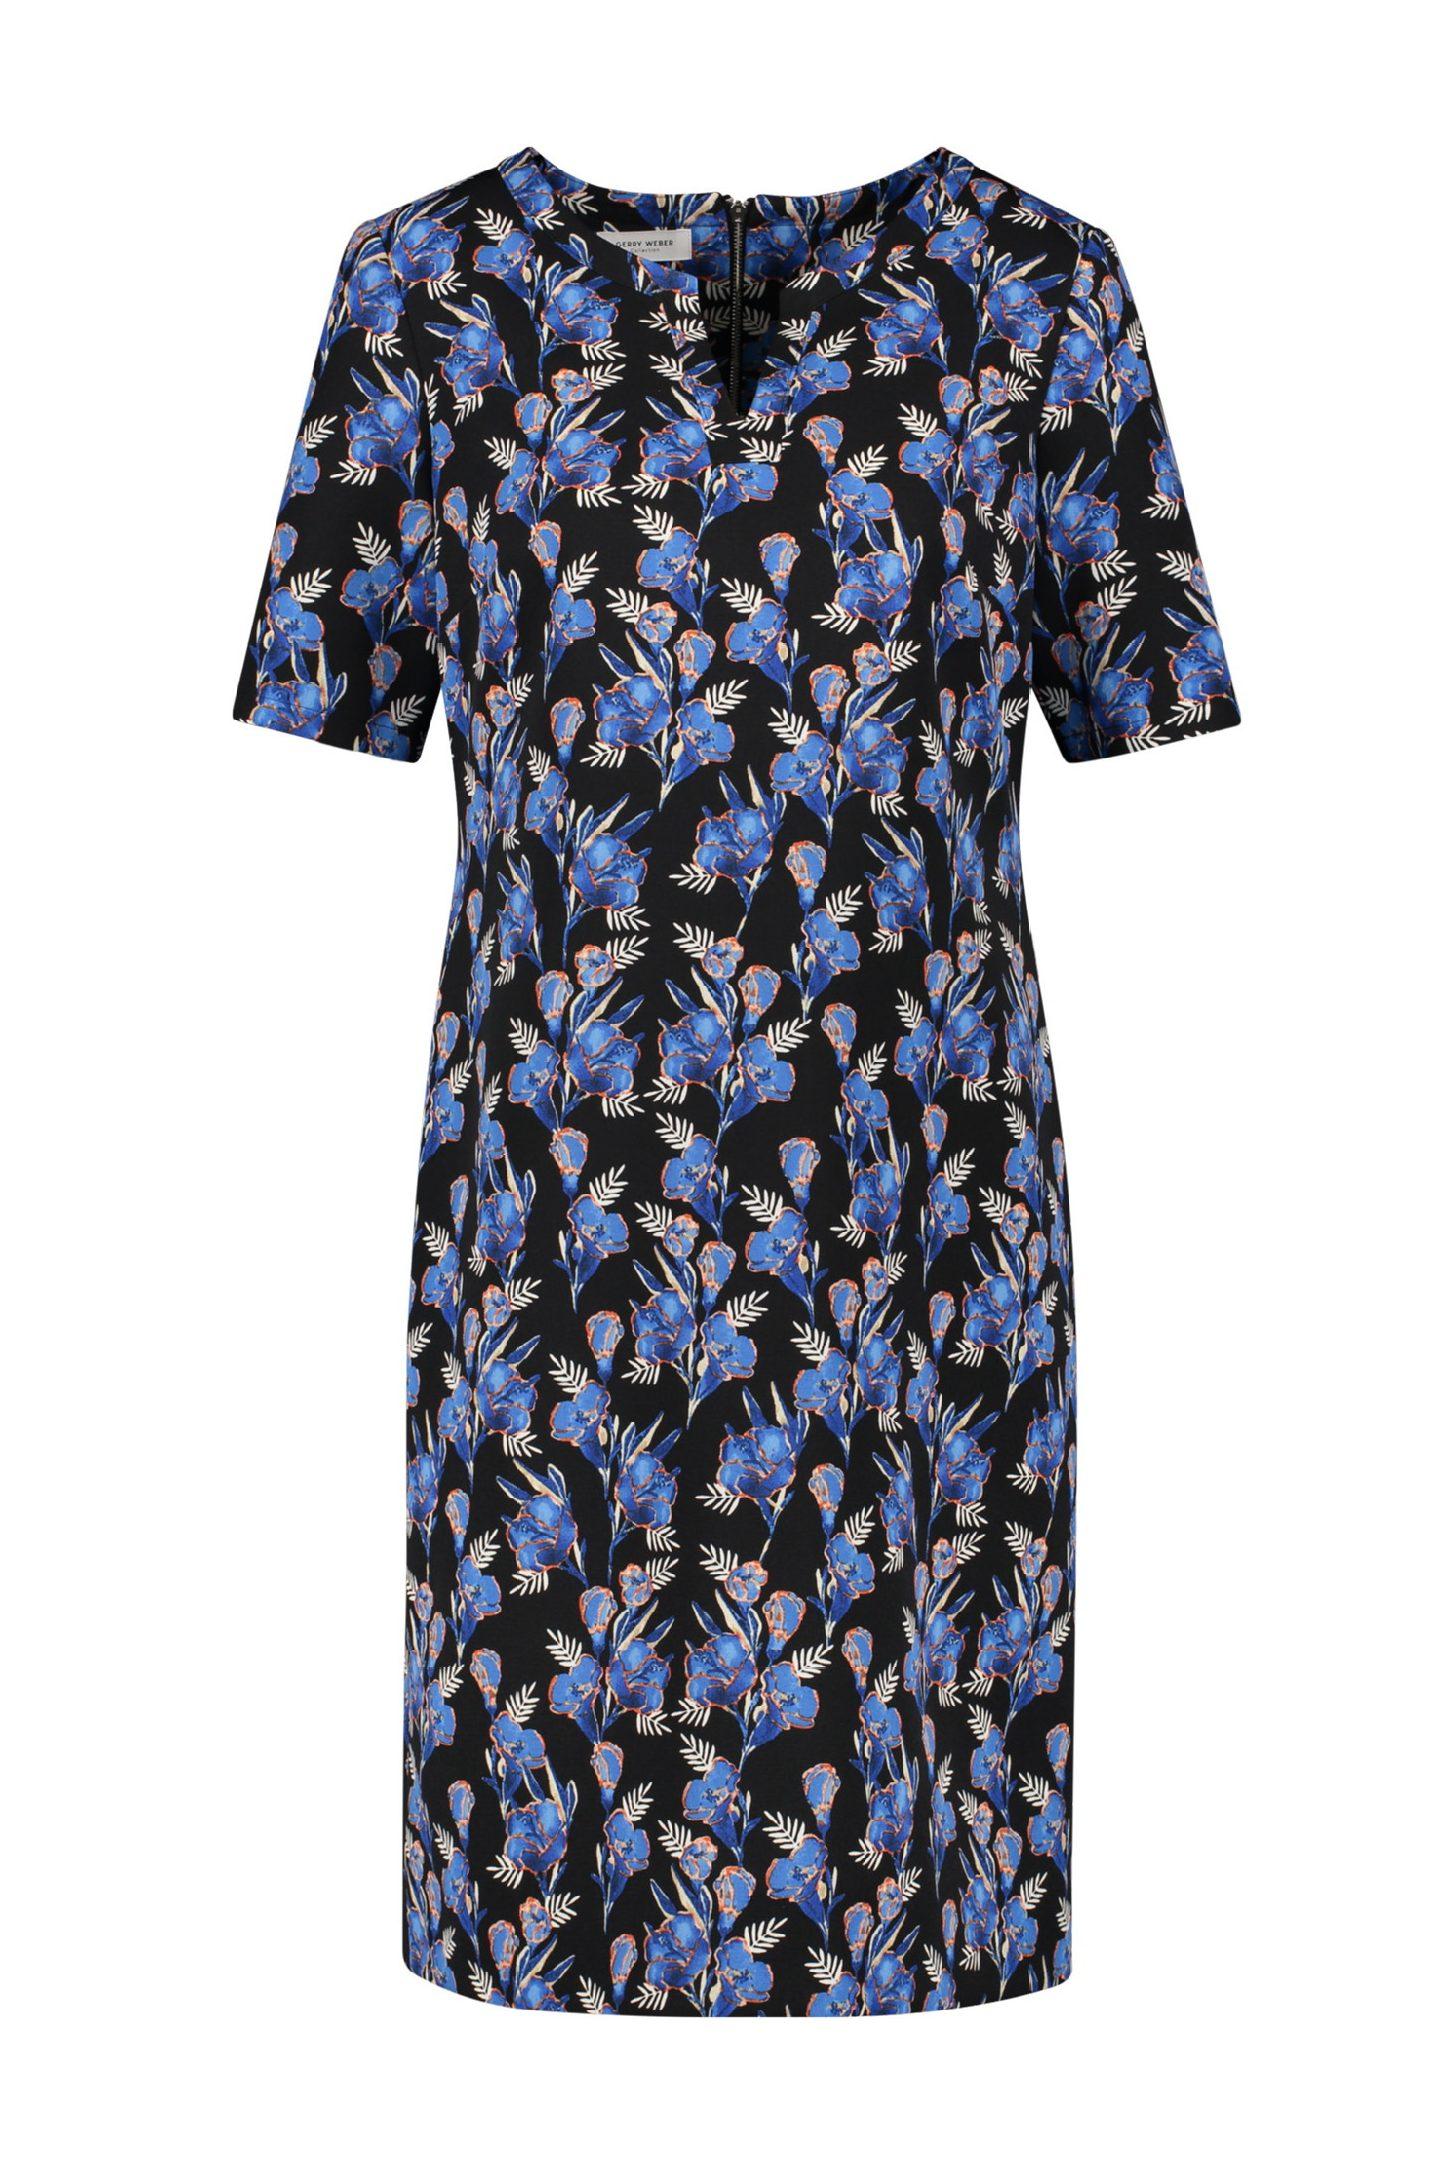 GERRY WEBER – Kjole med print